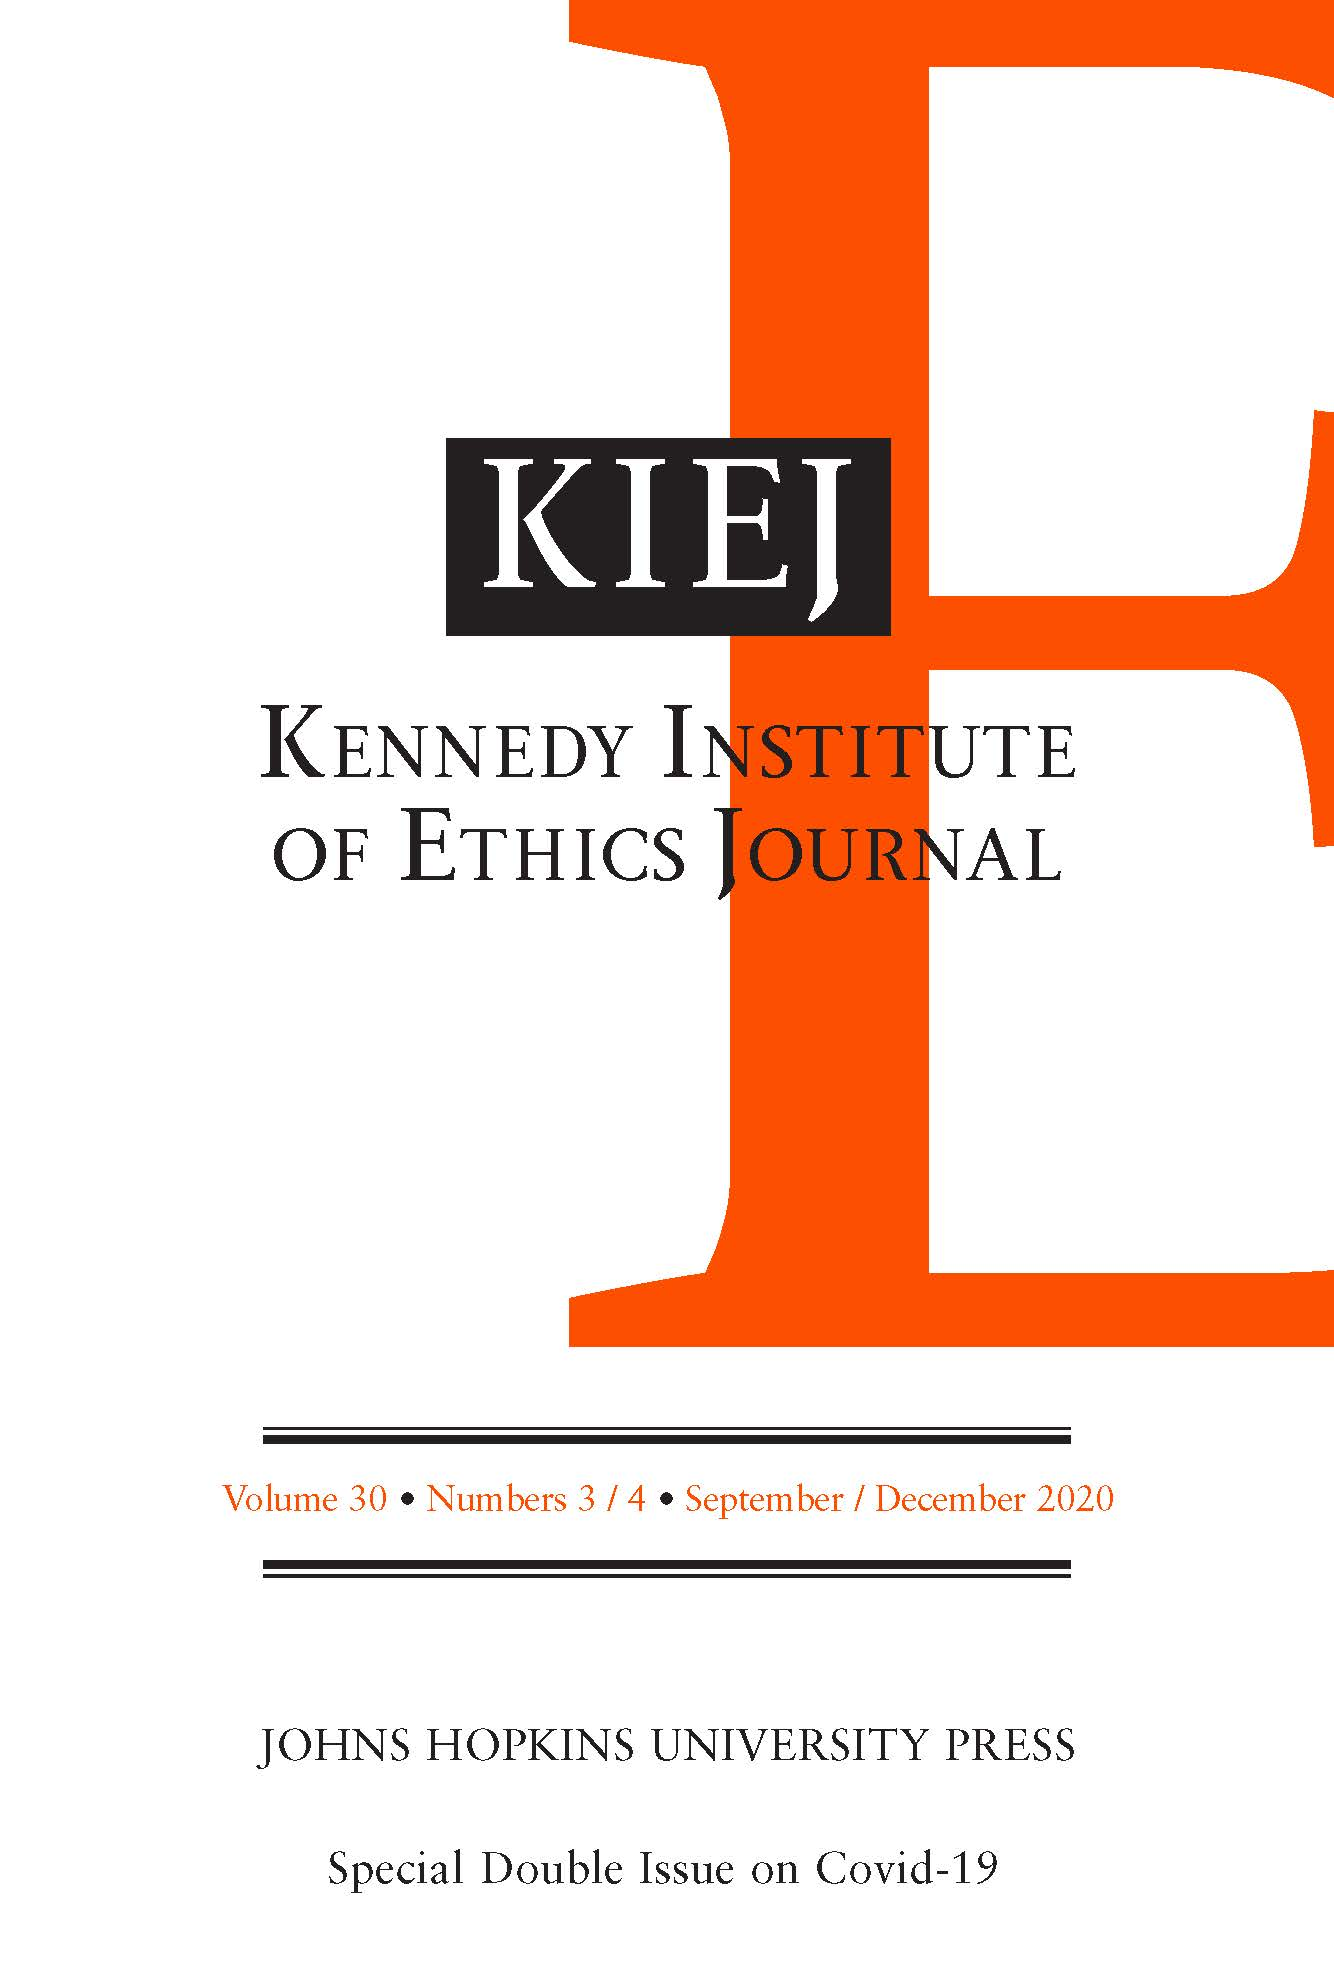 Kennedy Institute of Ethics Journal: Volume 30, Numbers 3-4, September/December 2020